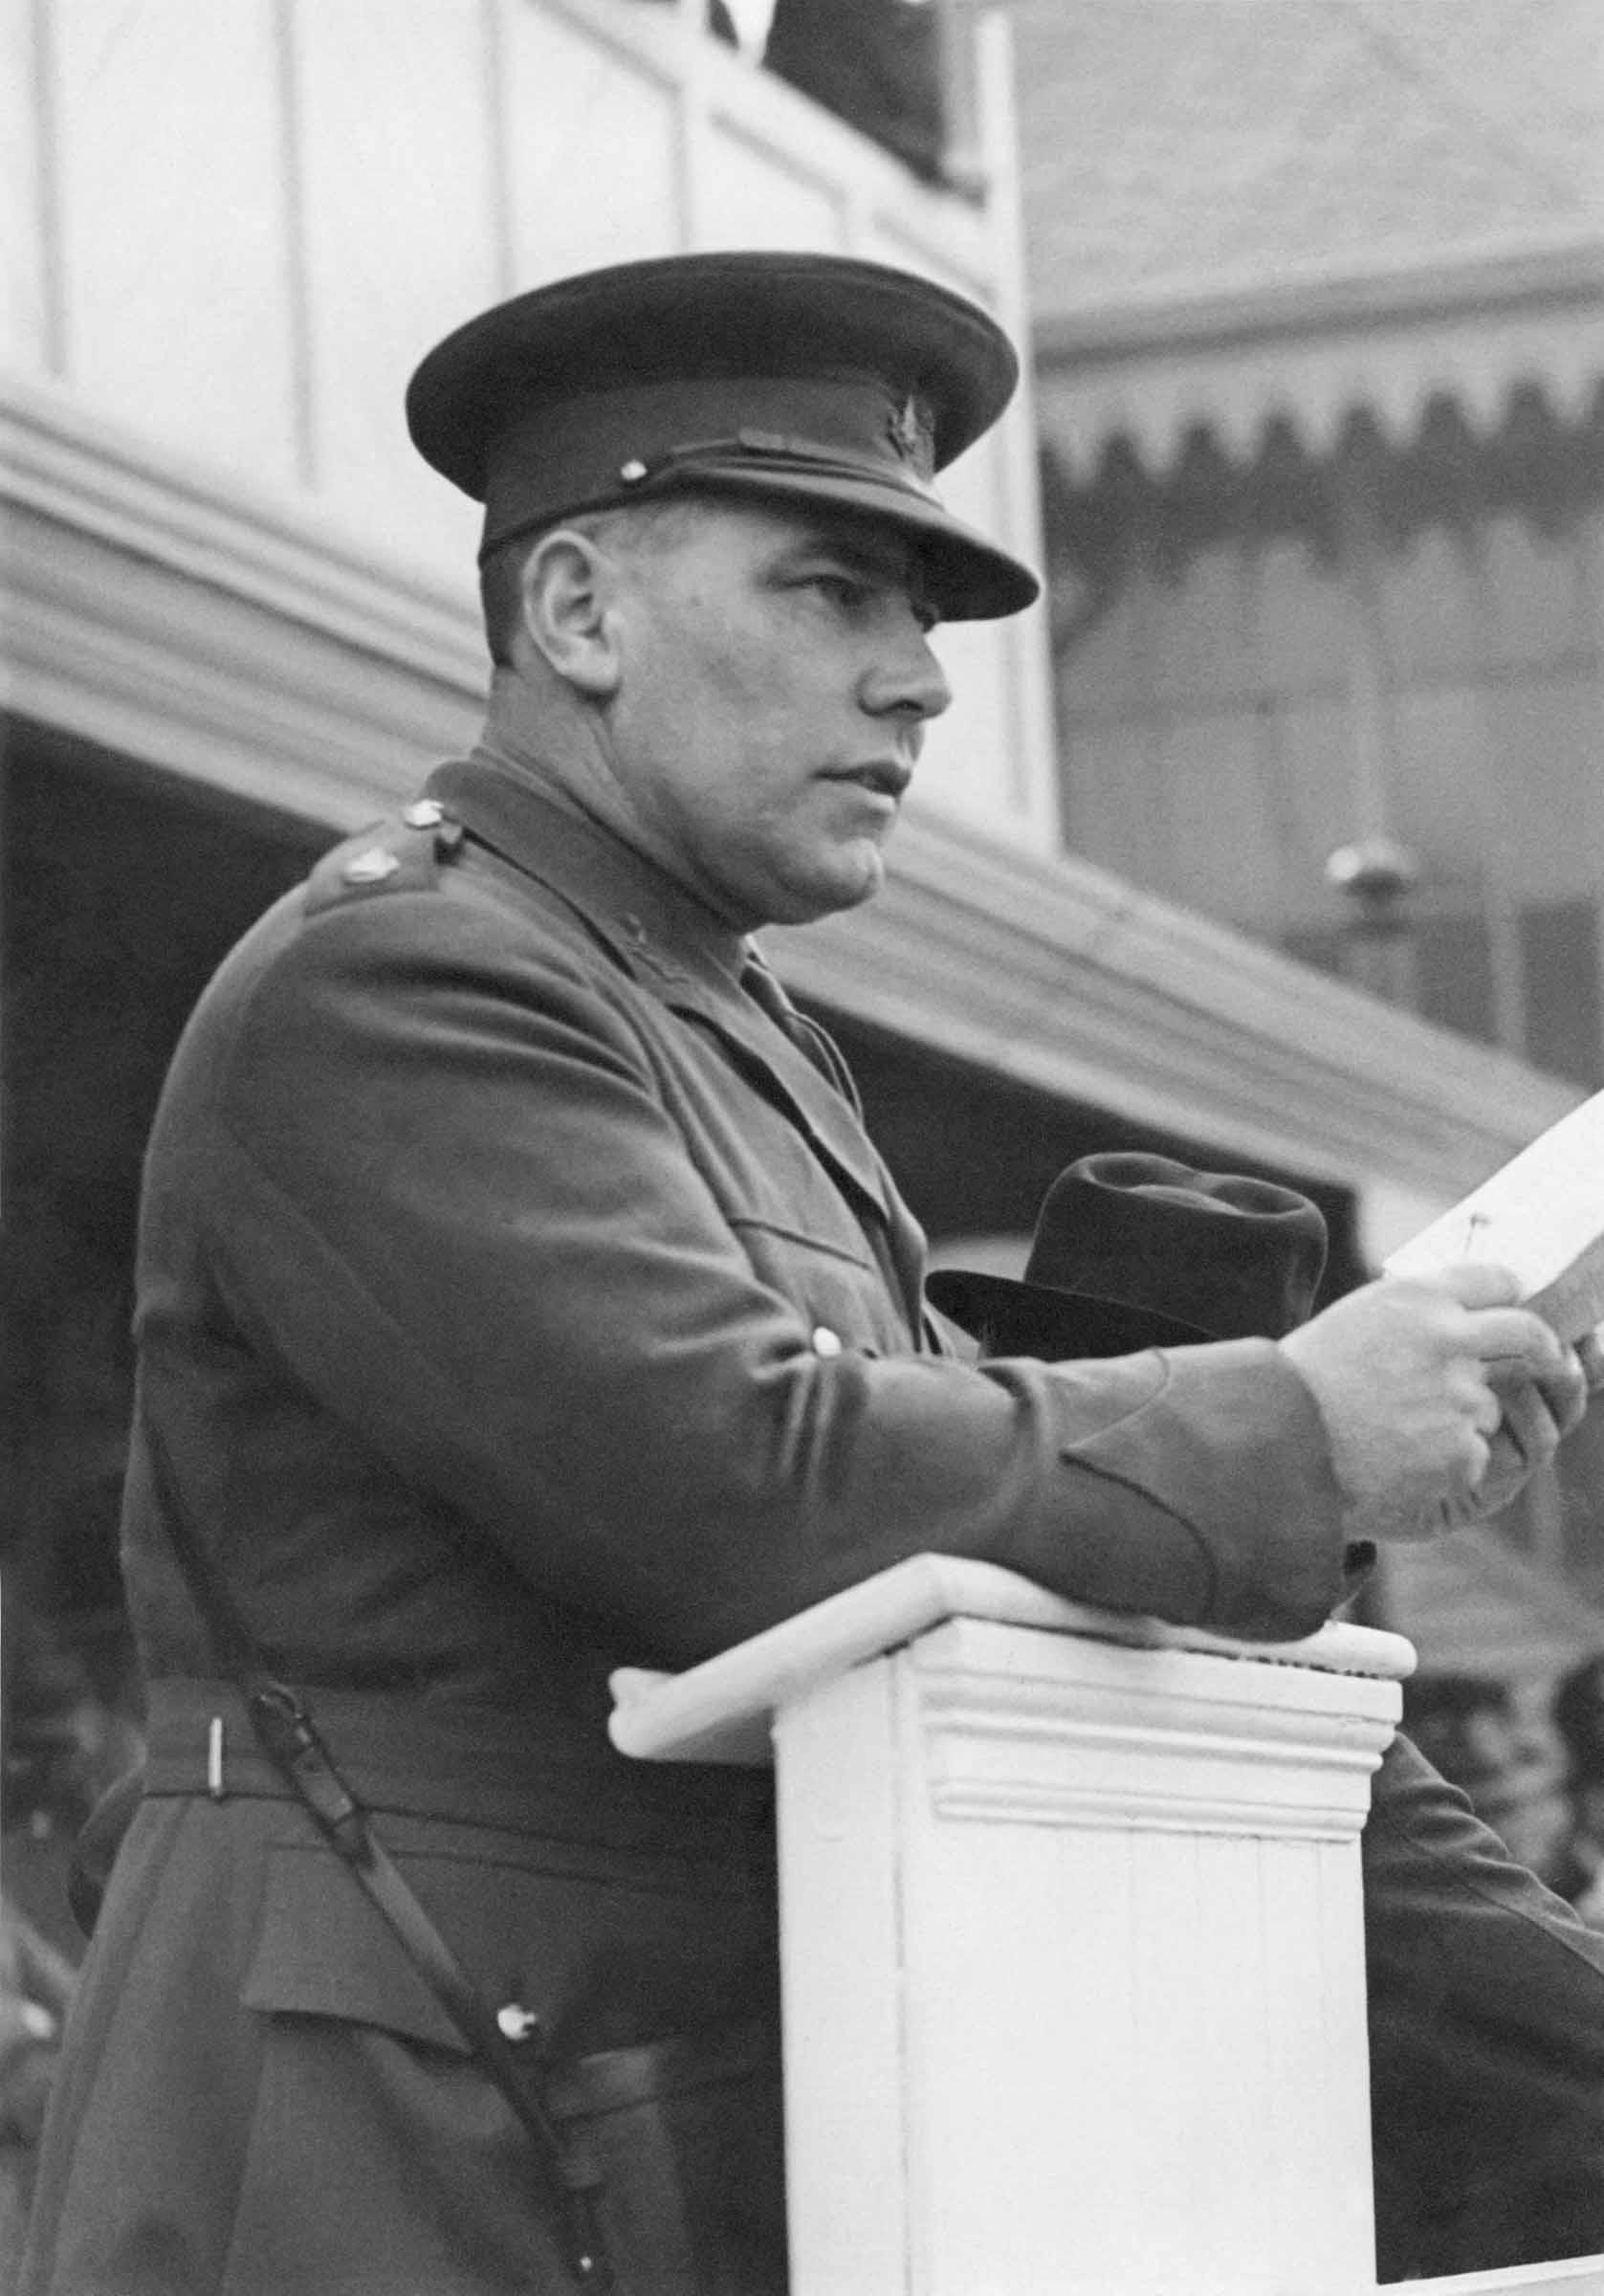 Major Leslie Petch OBE circa 1940